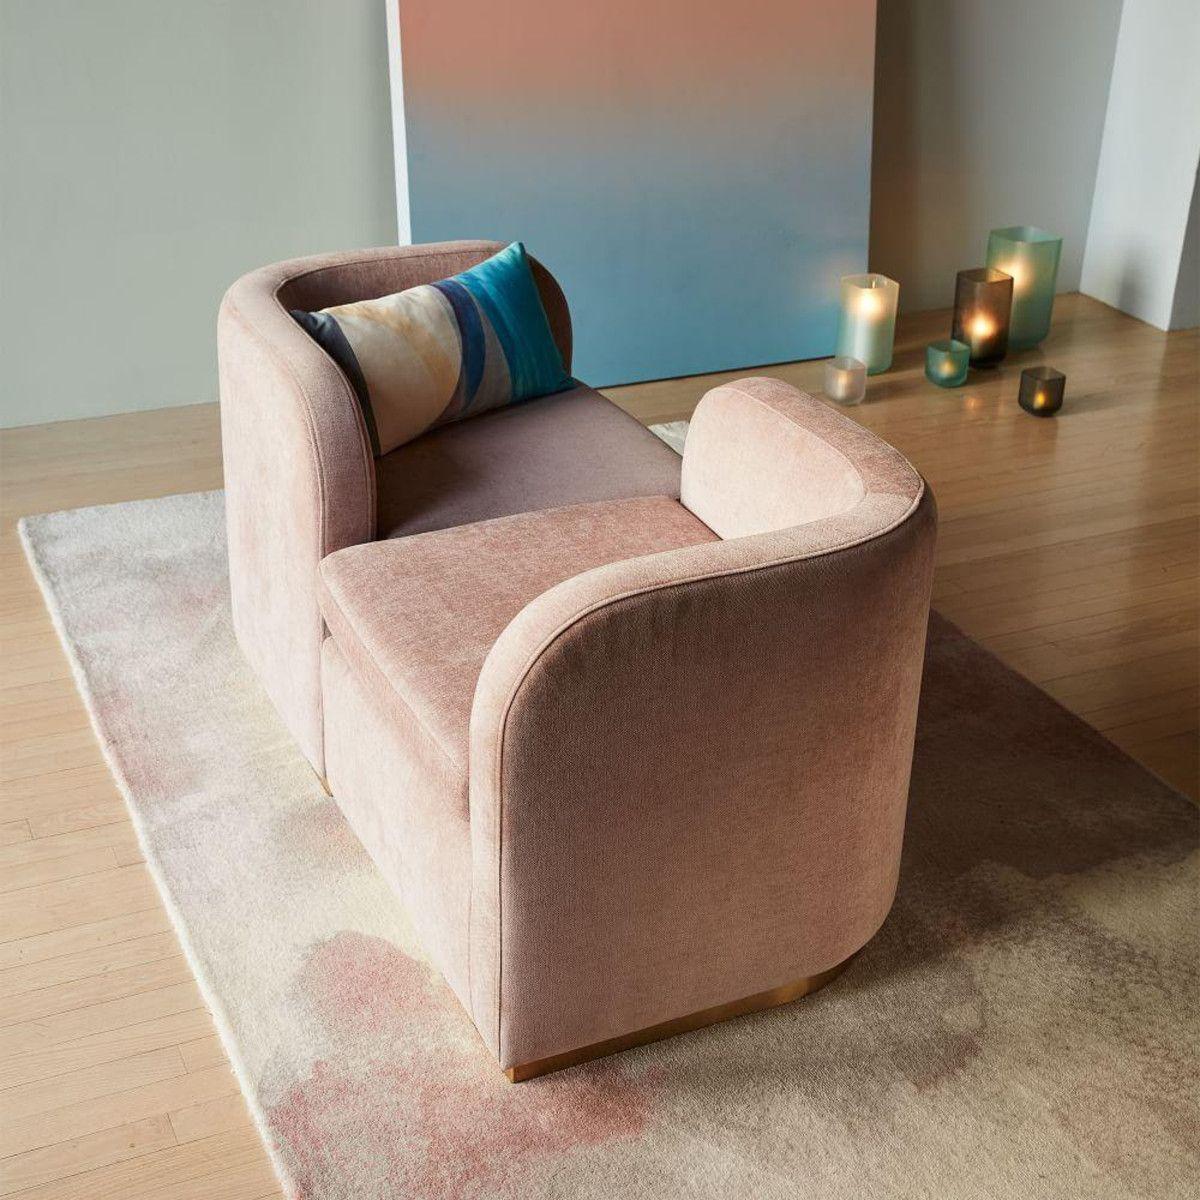 Roar Rabbit Tete A Tete Chair Bedroom Furniture Chairs